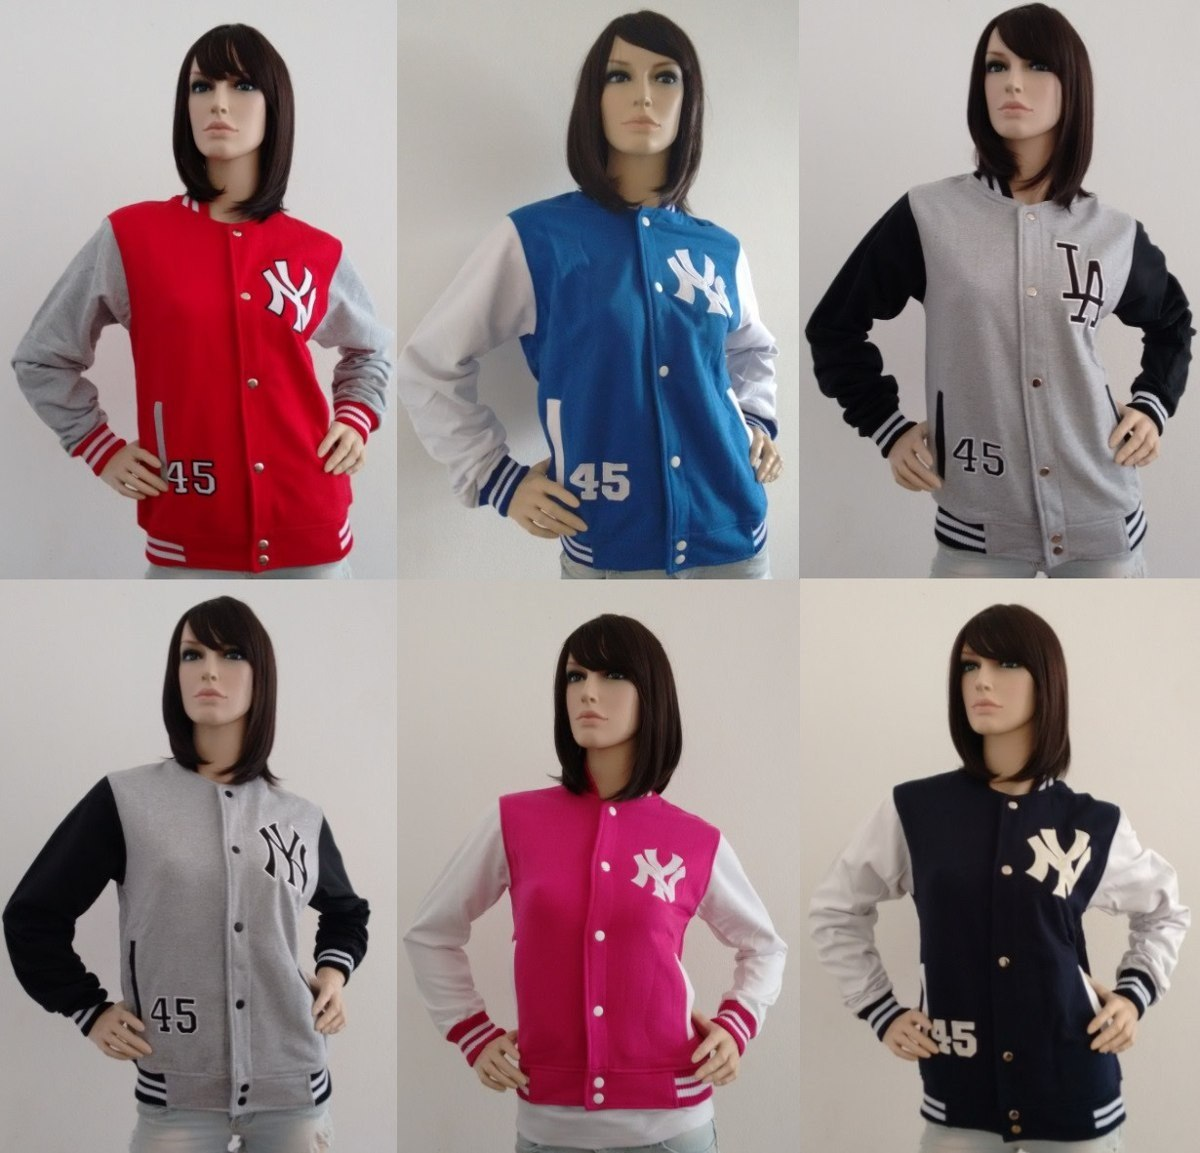 Jaqueta Feminina College Moletom Baseball - R  149 38c0b48ca36a6